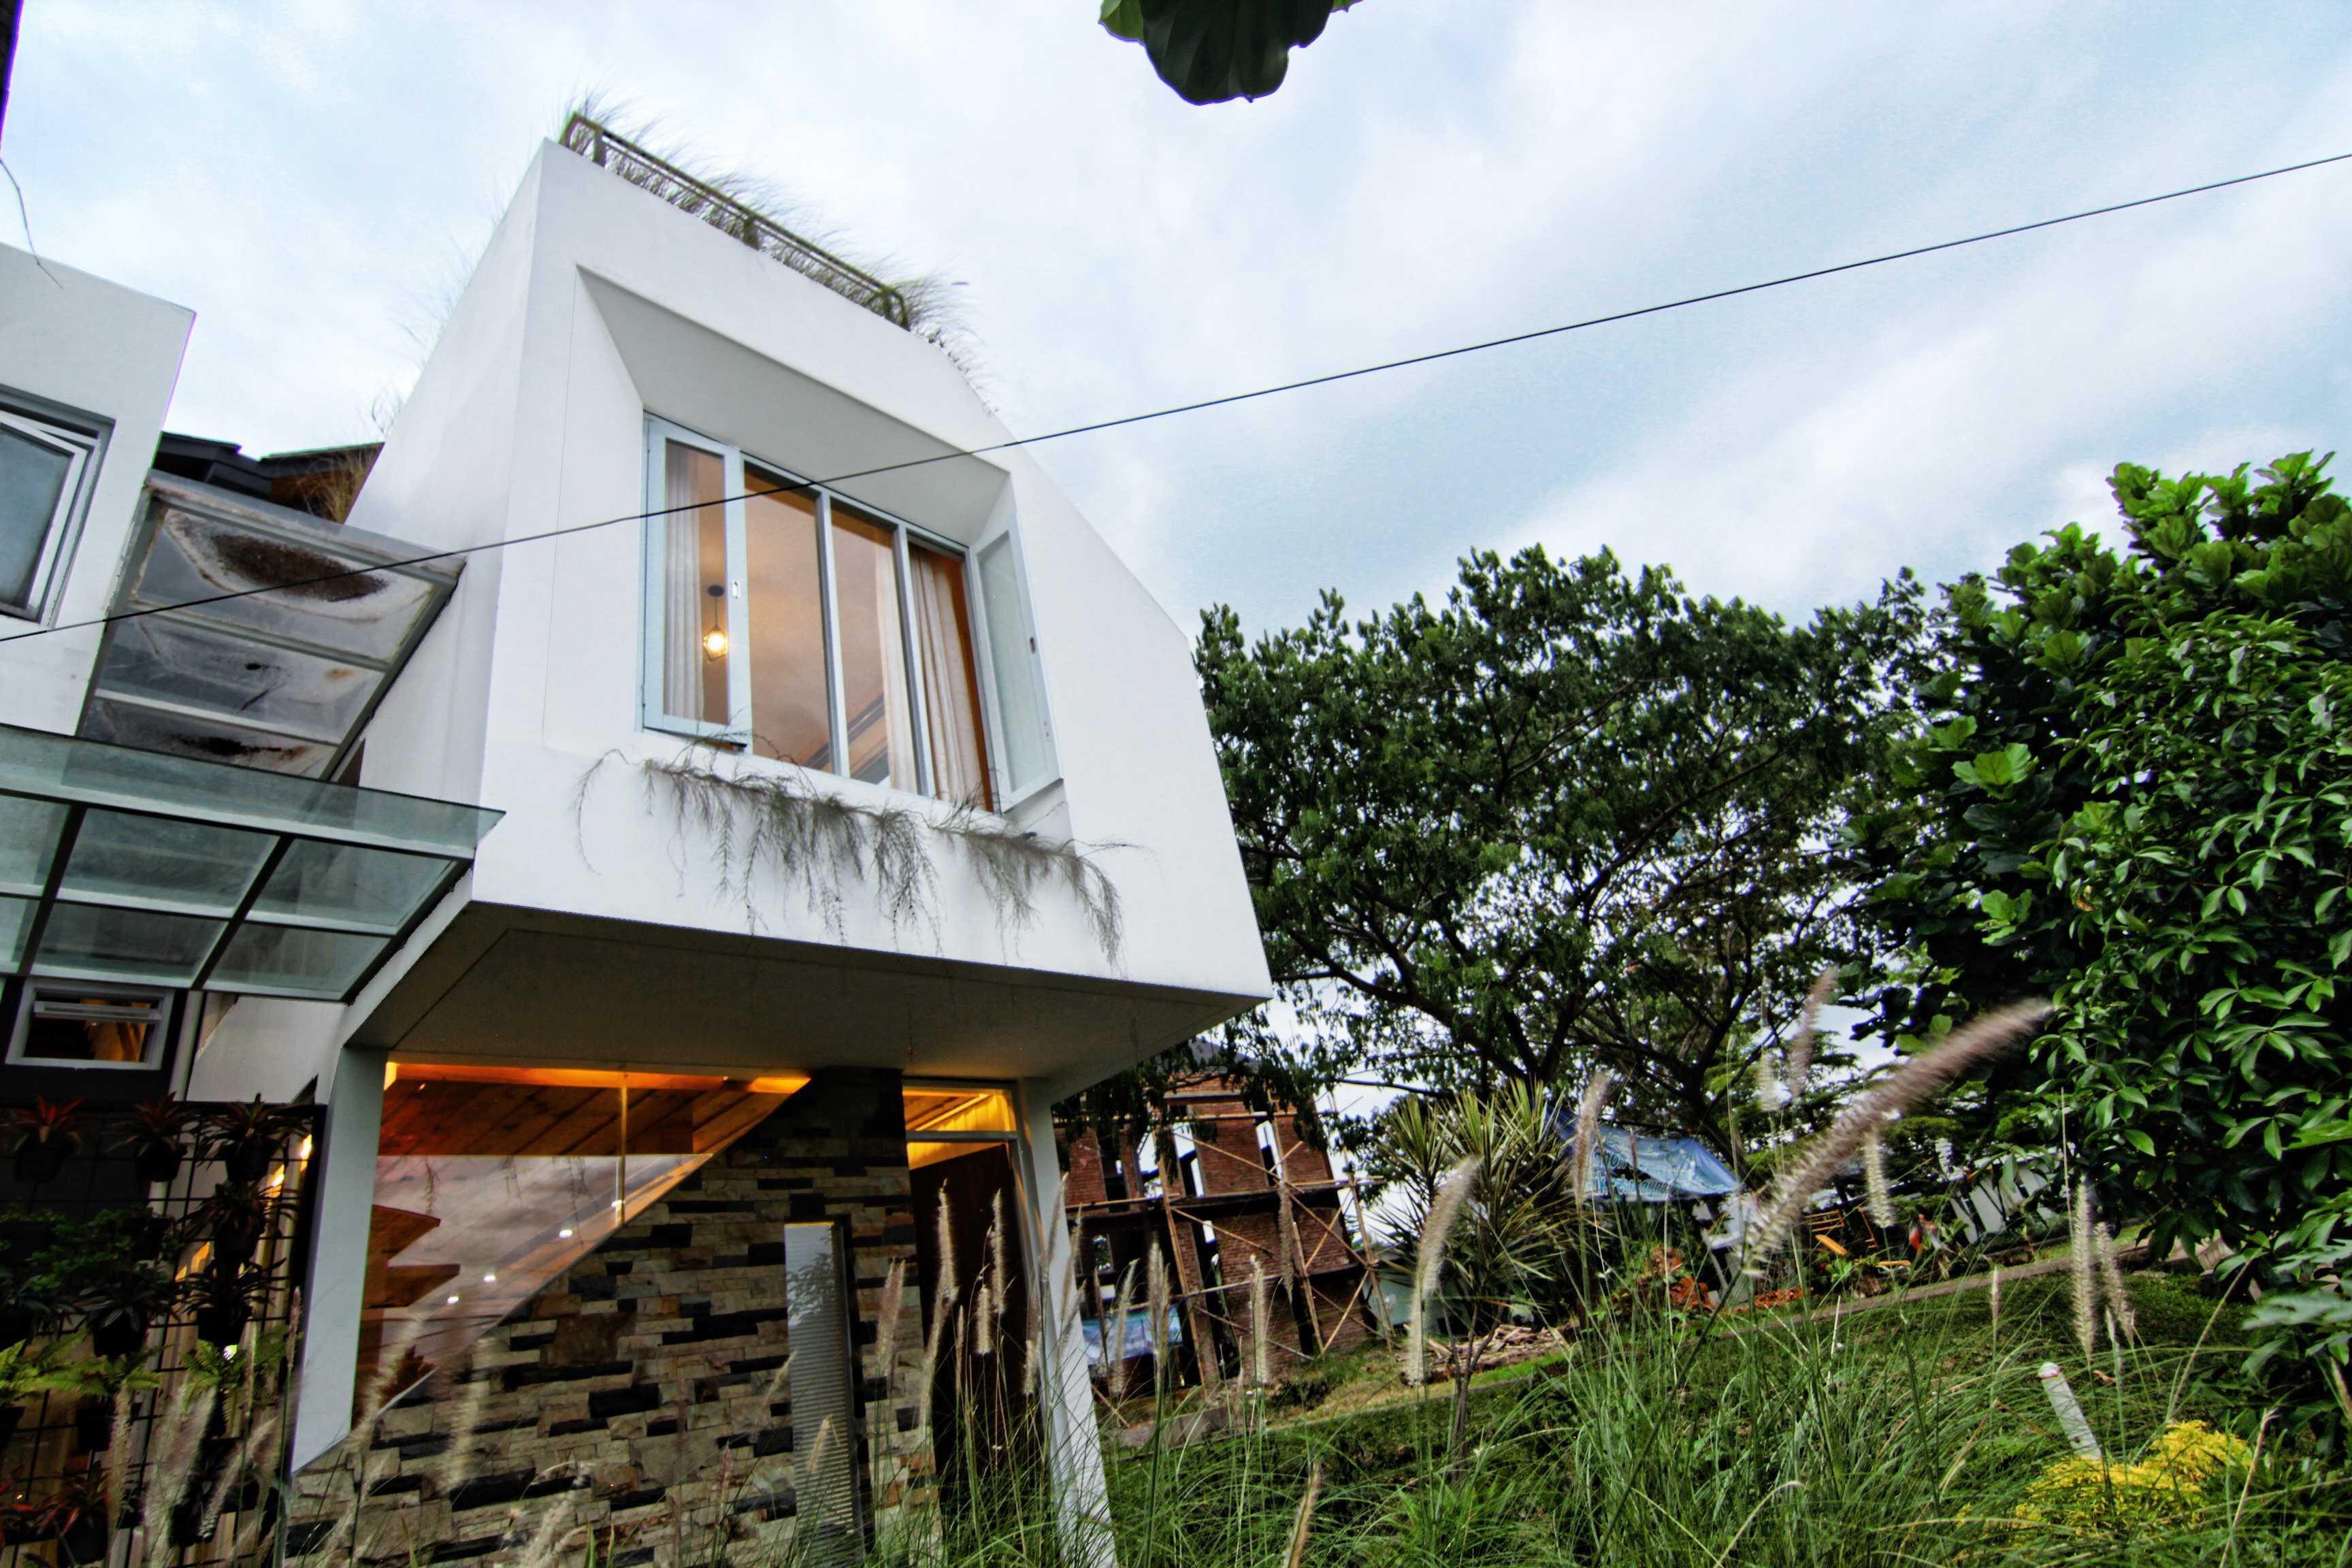 Mineli Architects Al House Baros, Cimahi Tengah, Kota Cimahi, Jawa Barat, Indonesia Baros, Cimahi Tengah, Kota Cimahi, Jawa Barat, Indonesia Exterior View   45268